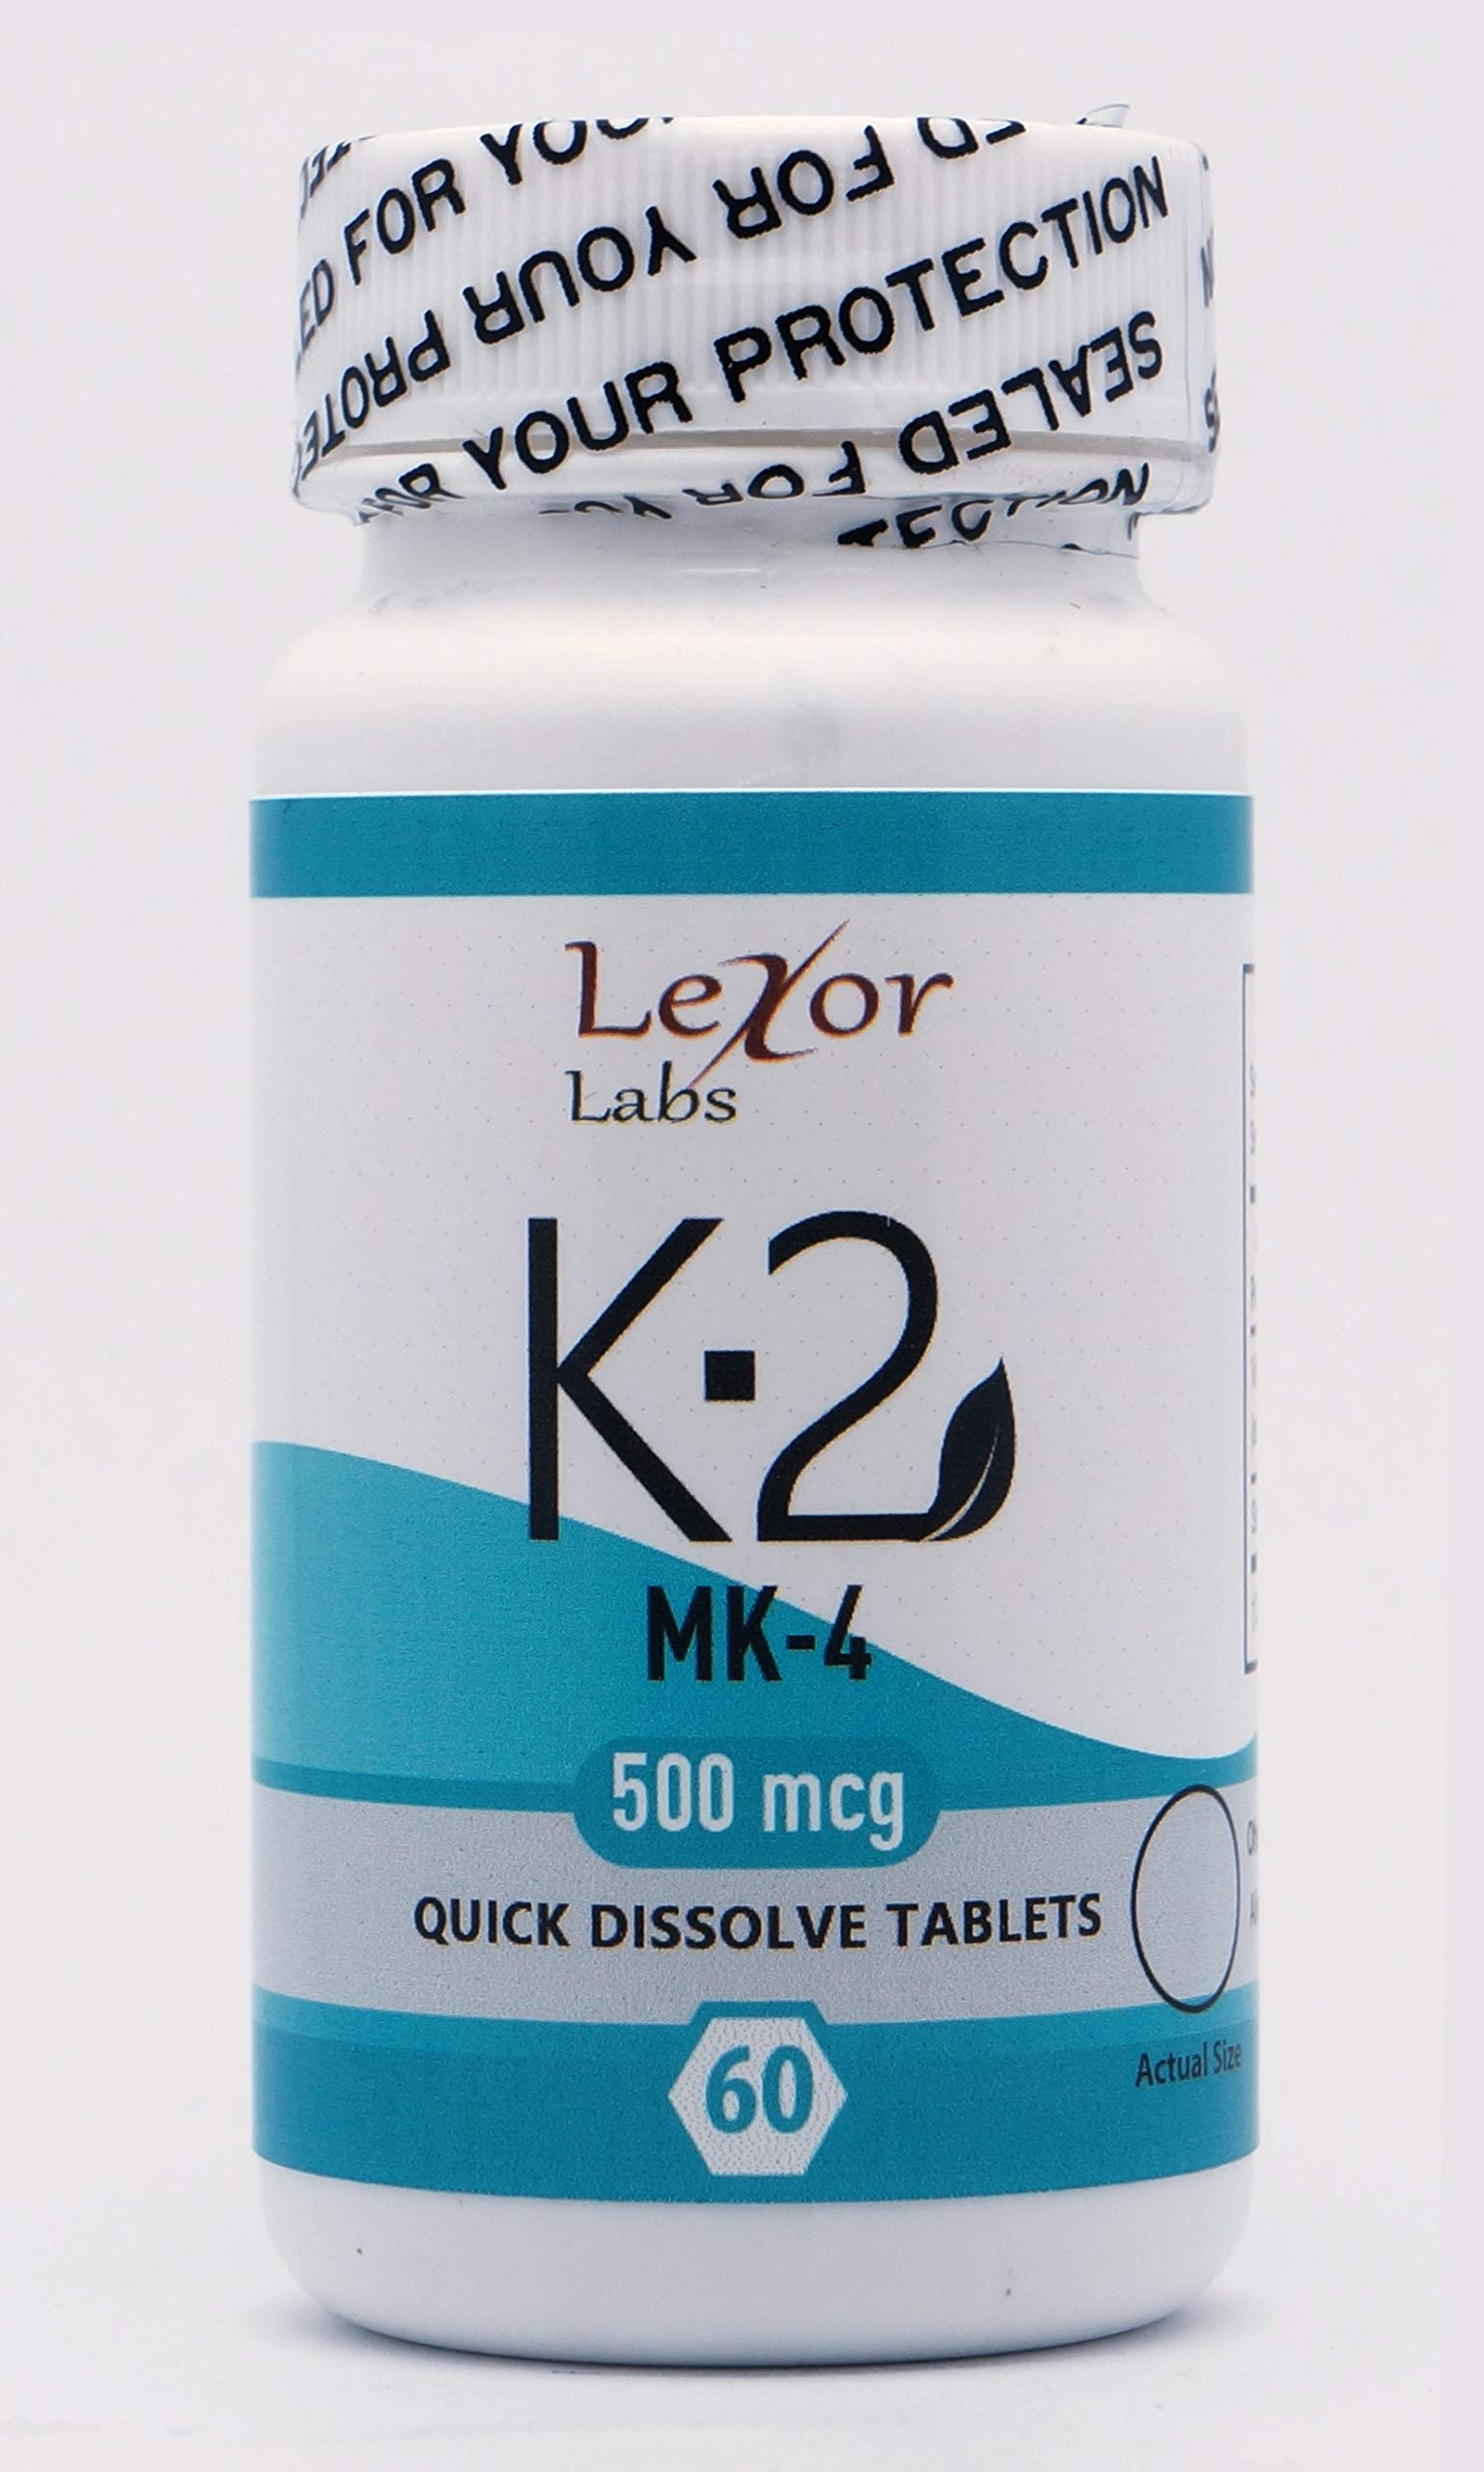 Lexor Labs Vitamin K-2 MK4 Supplements - Quick Dissolve Tablets for Healthy Arteries & Strong Bones, 500 Mcg, 60Count